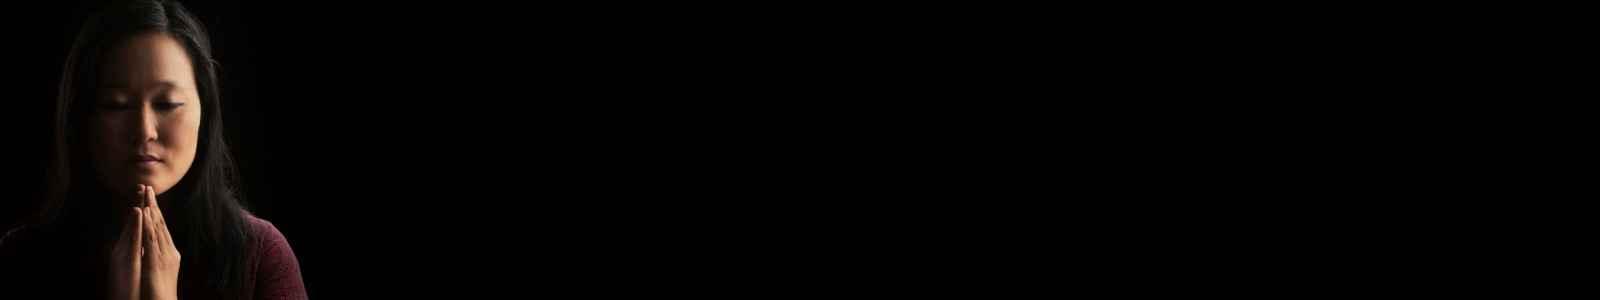 1120-sjaelens-vej-karina-bundgaard-1600x300.jpg